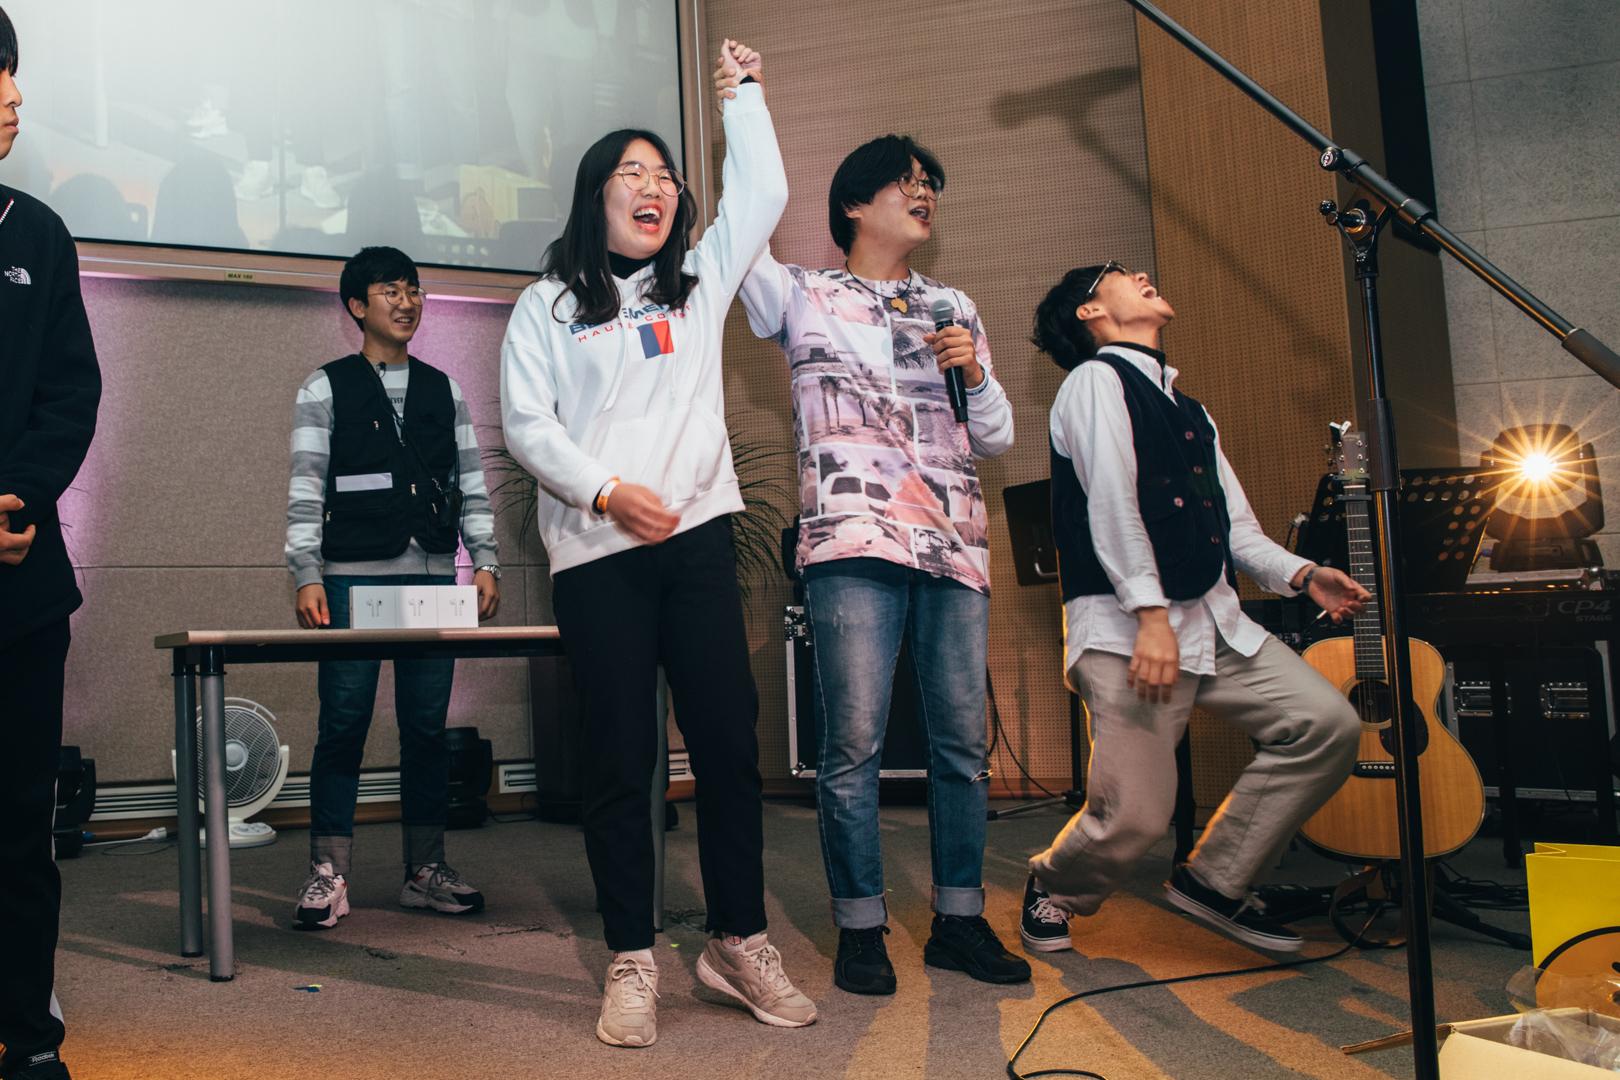 Youthfestival-27.jpg